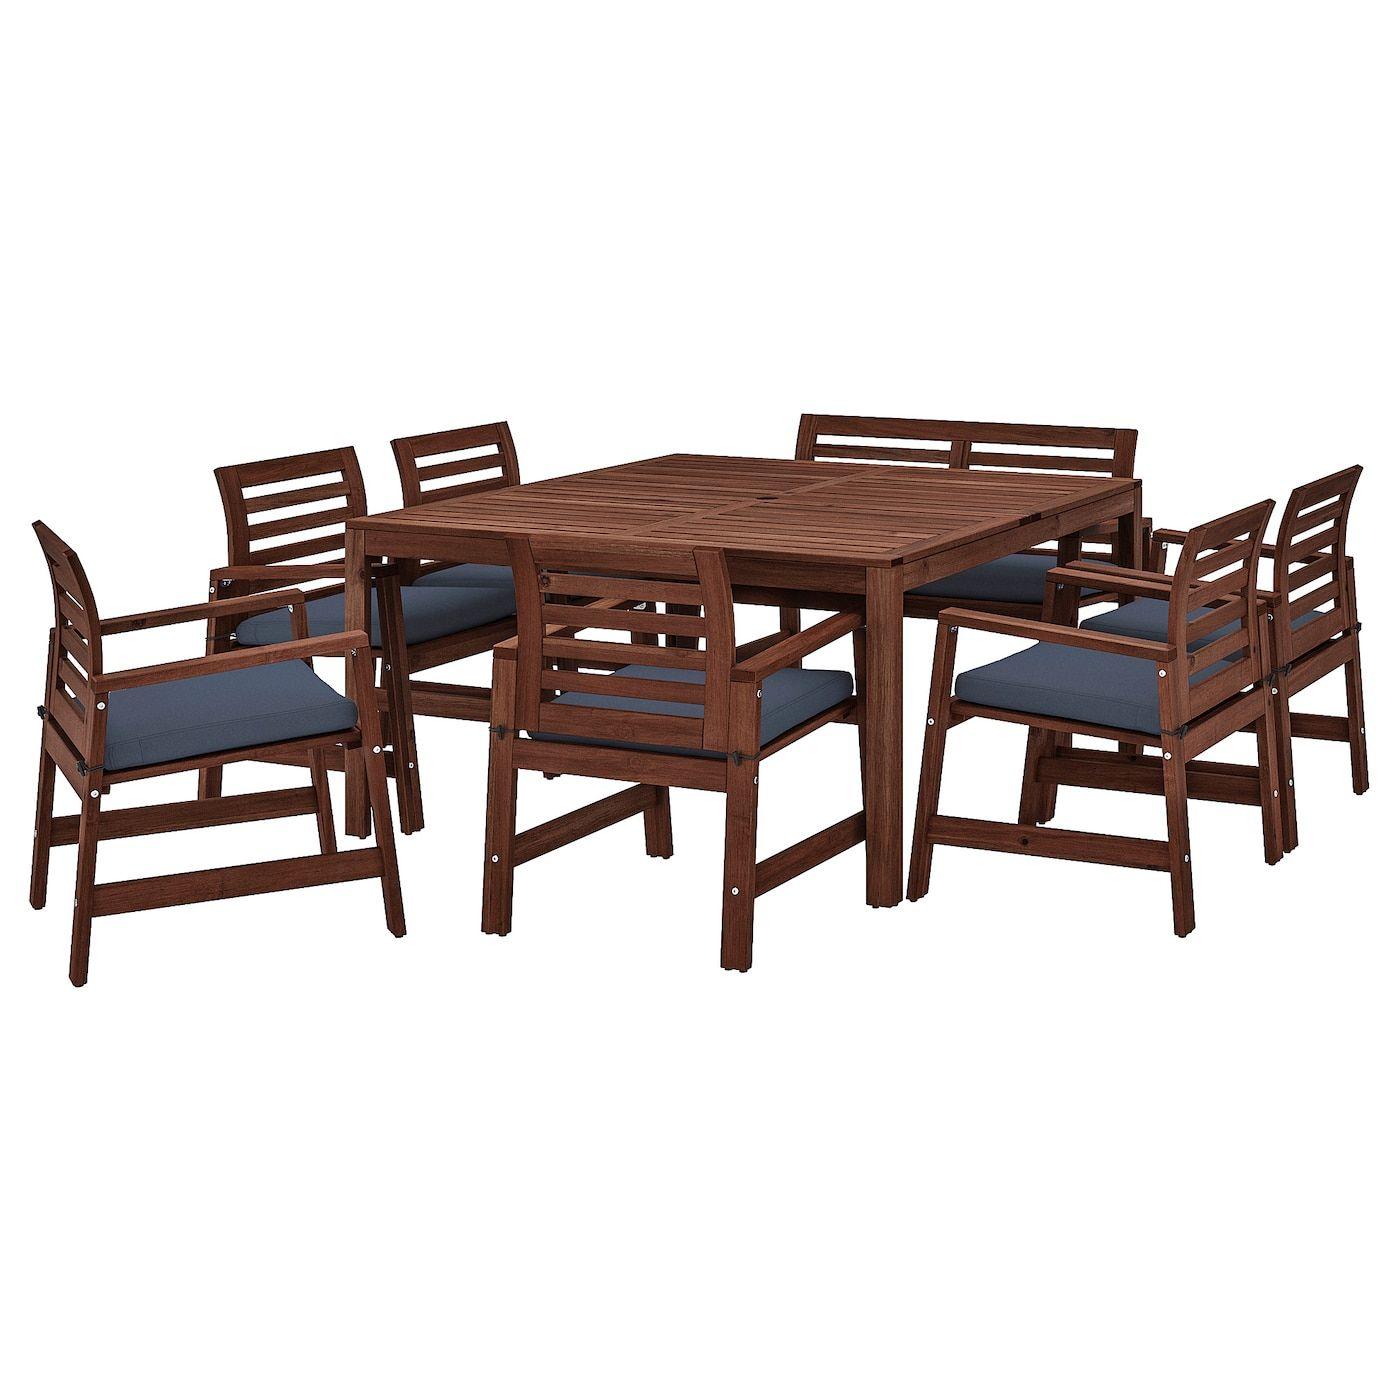 Ikea Applaro Table 6 Armchairs Bench Outdoor Applaro Brown In 2020 Ikea Outdoor Wooden Outdoor Furniture Outdoor Furniture Sets